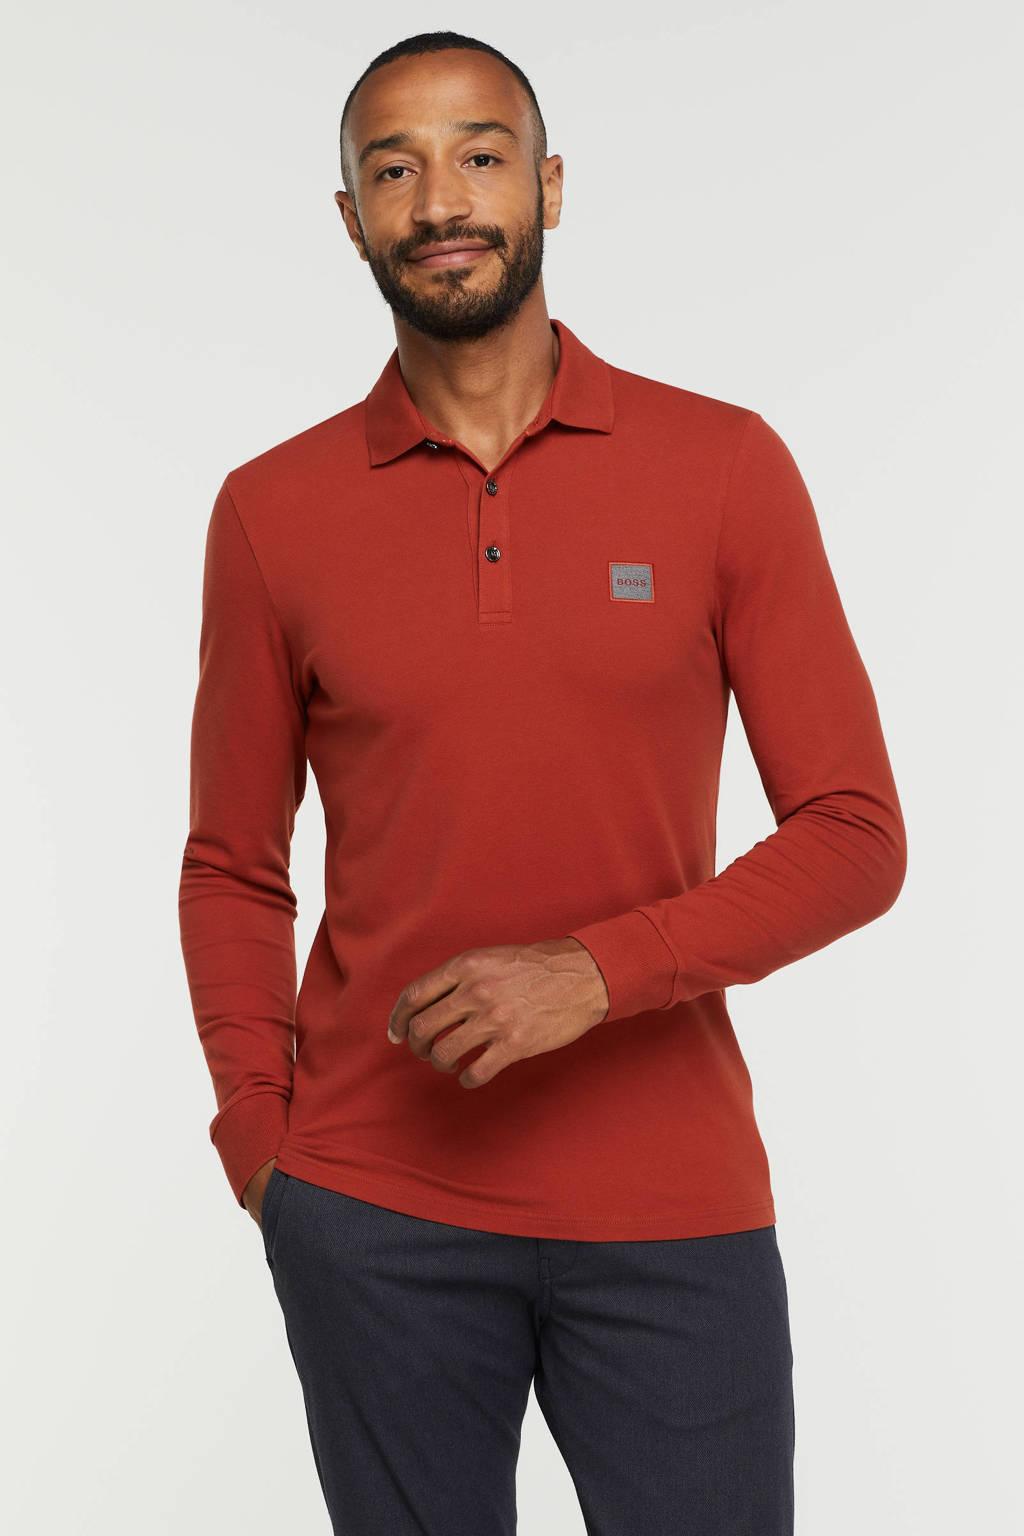 BOSS Casual polo Passerby 611 medium red, 611 Medium Red